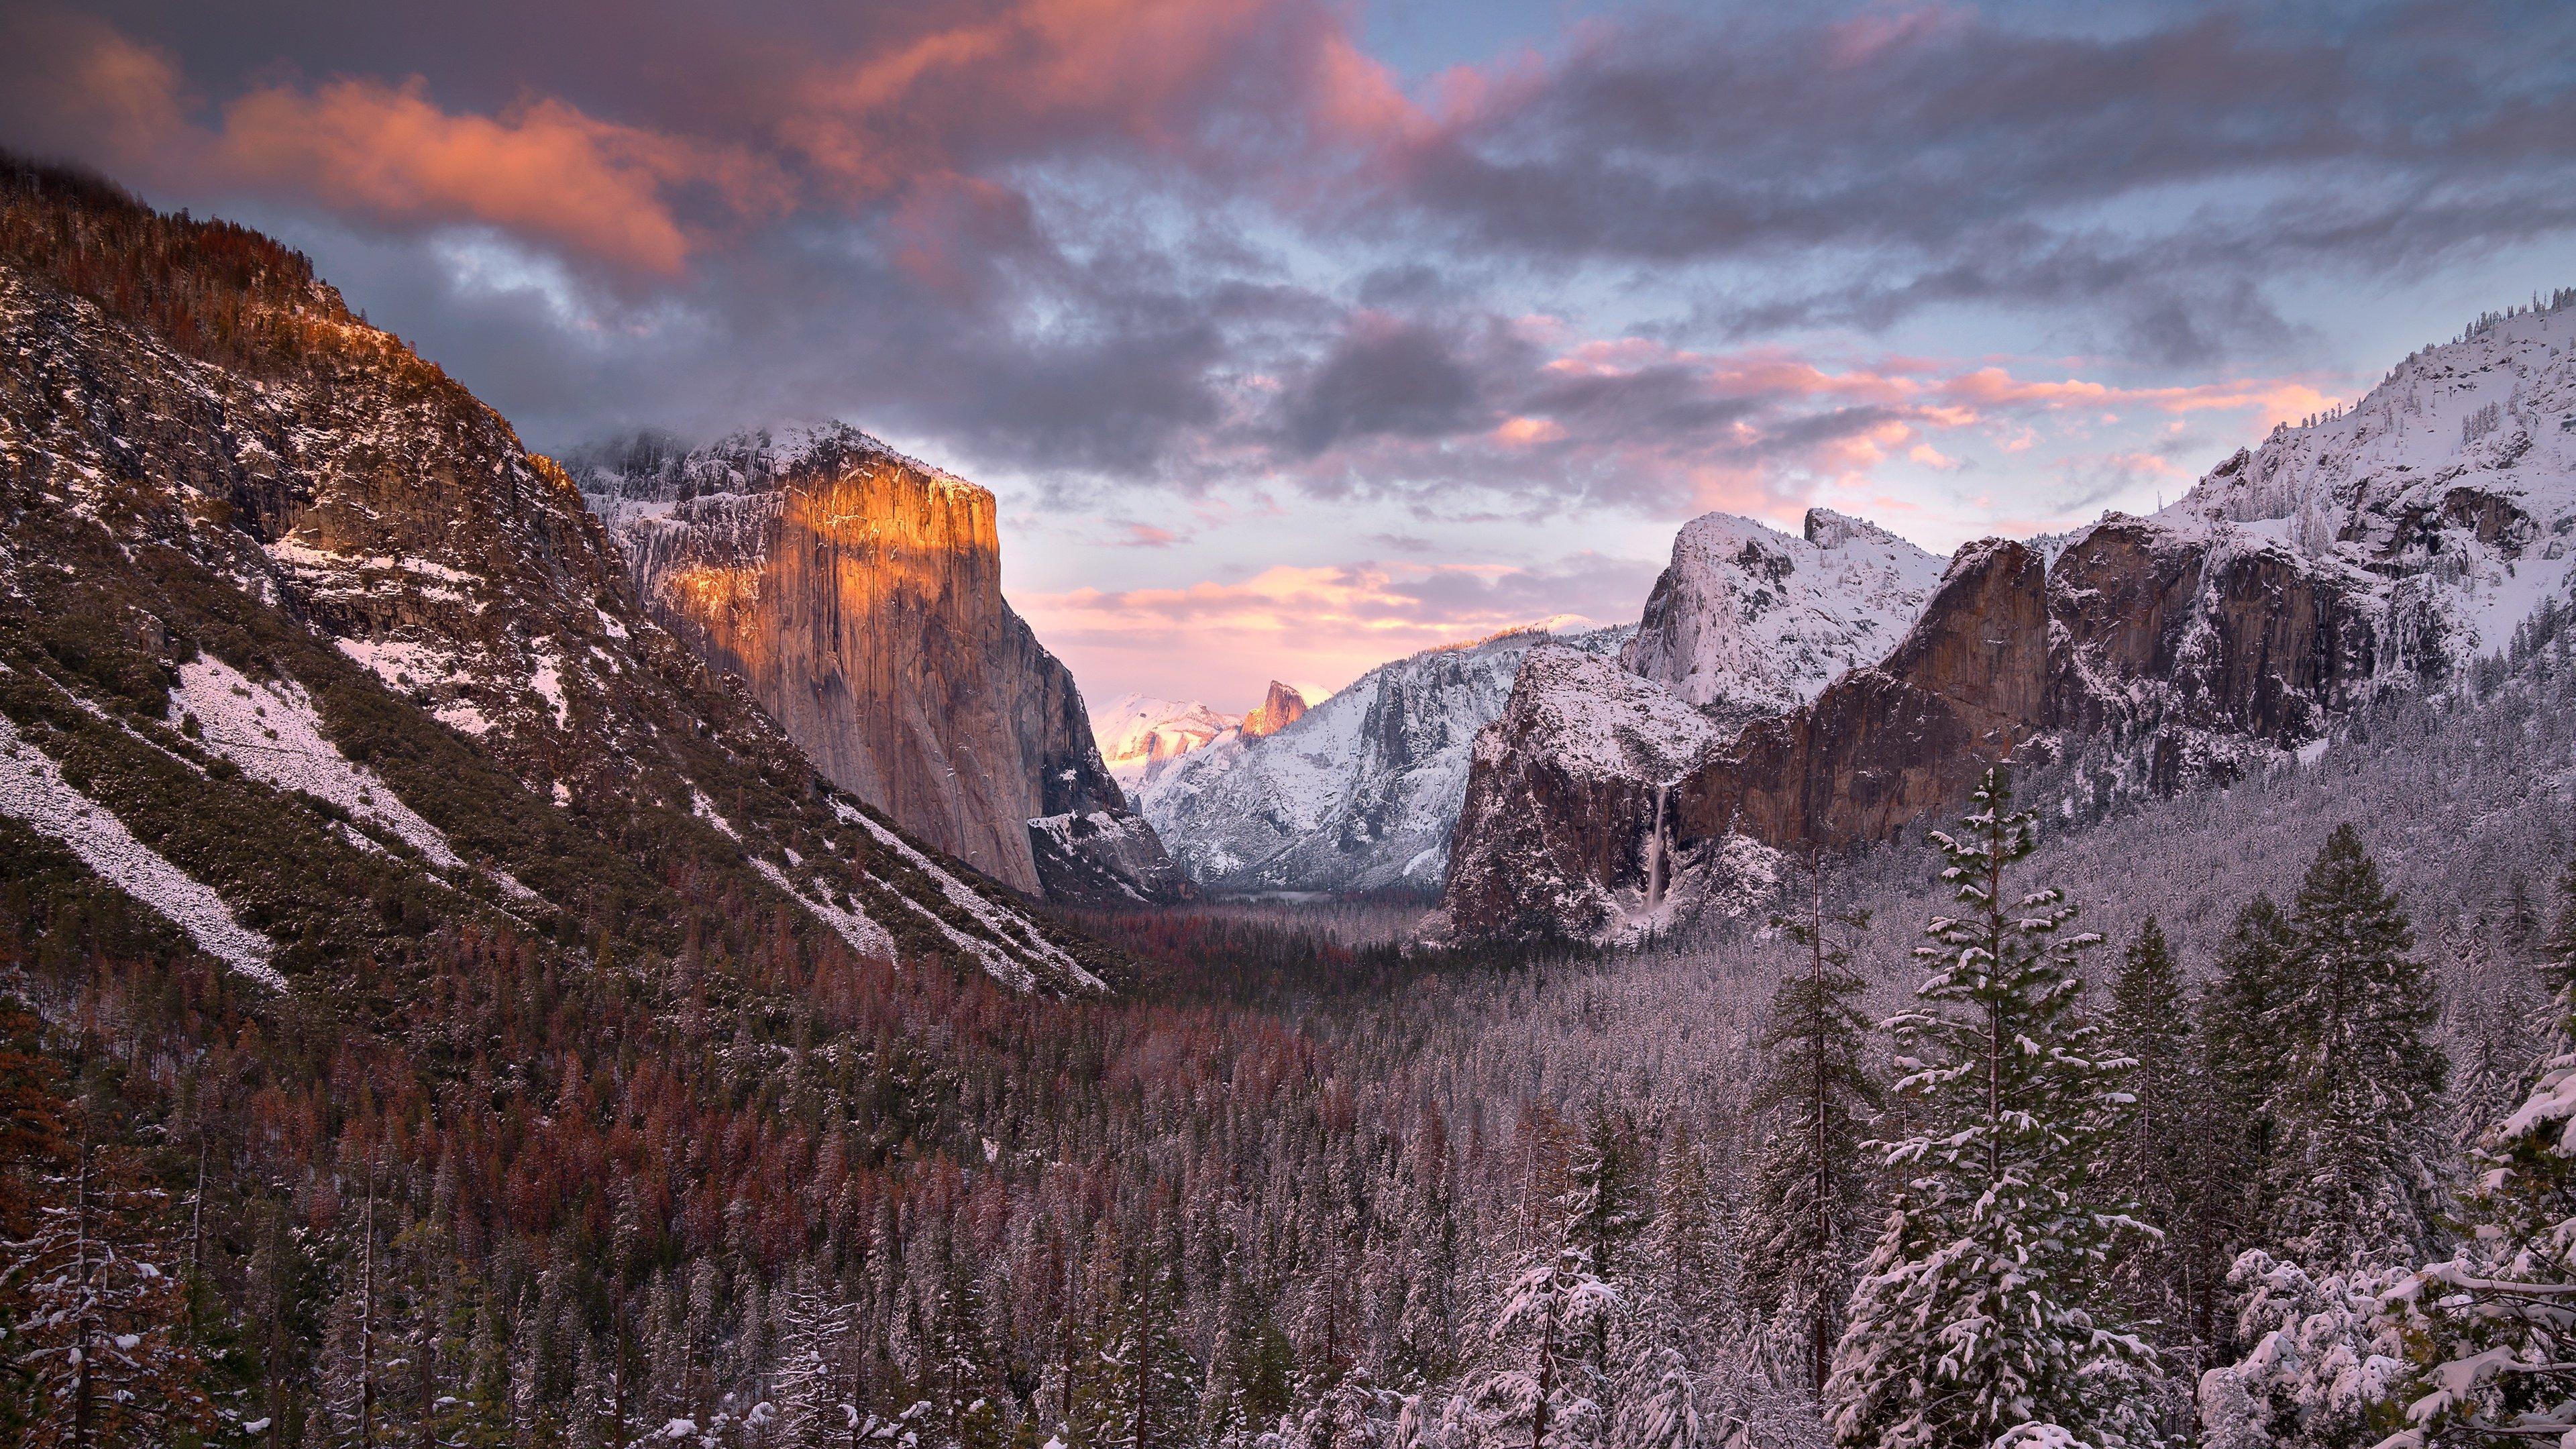 Fondos de pantalla Yosemite al atardecer